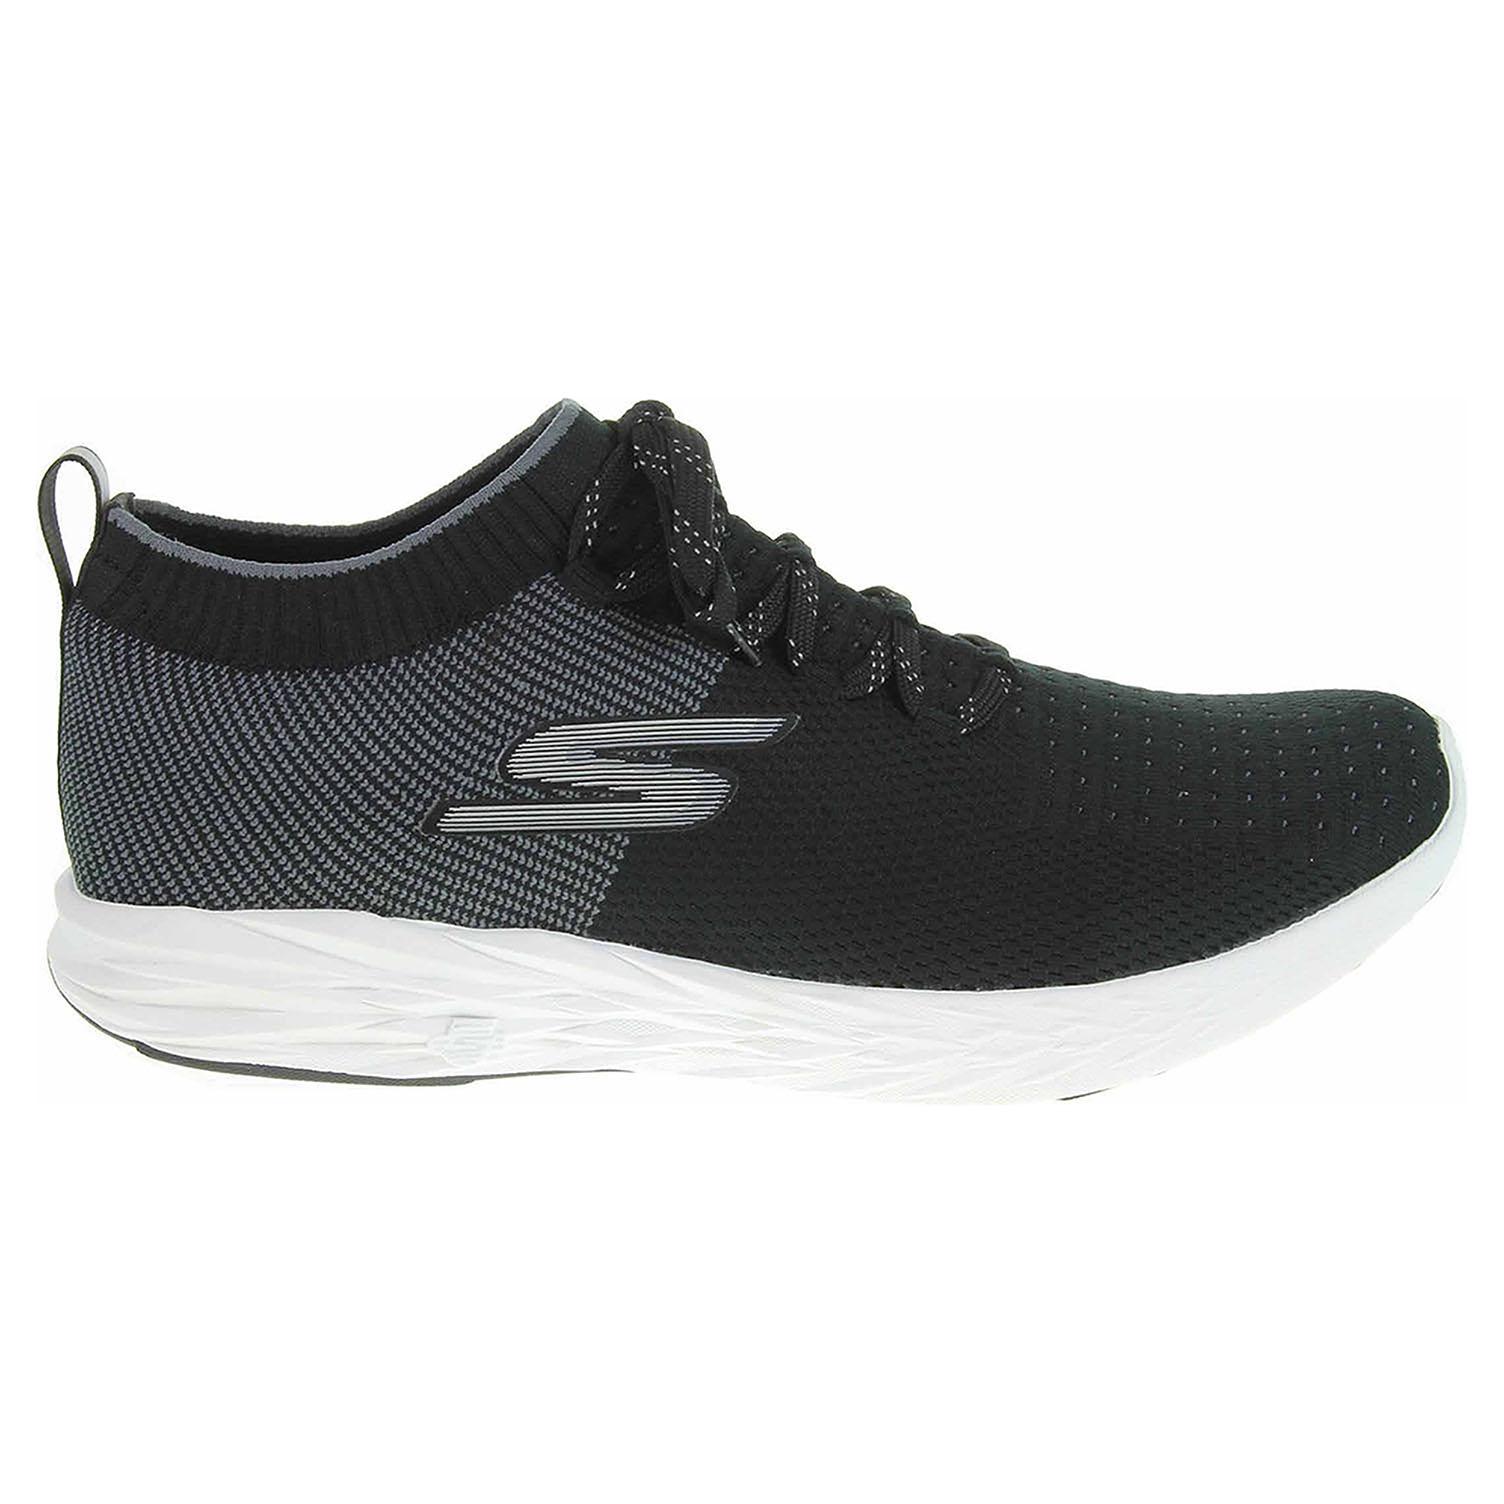 6020394b13b Ecco Skechers Go Run 6 black-white 24200210